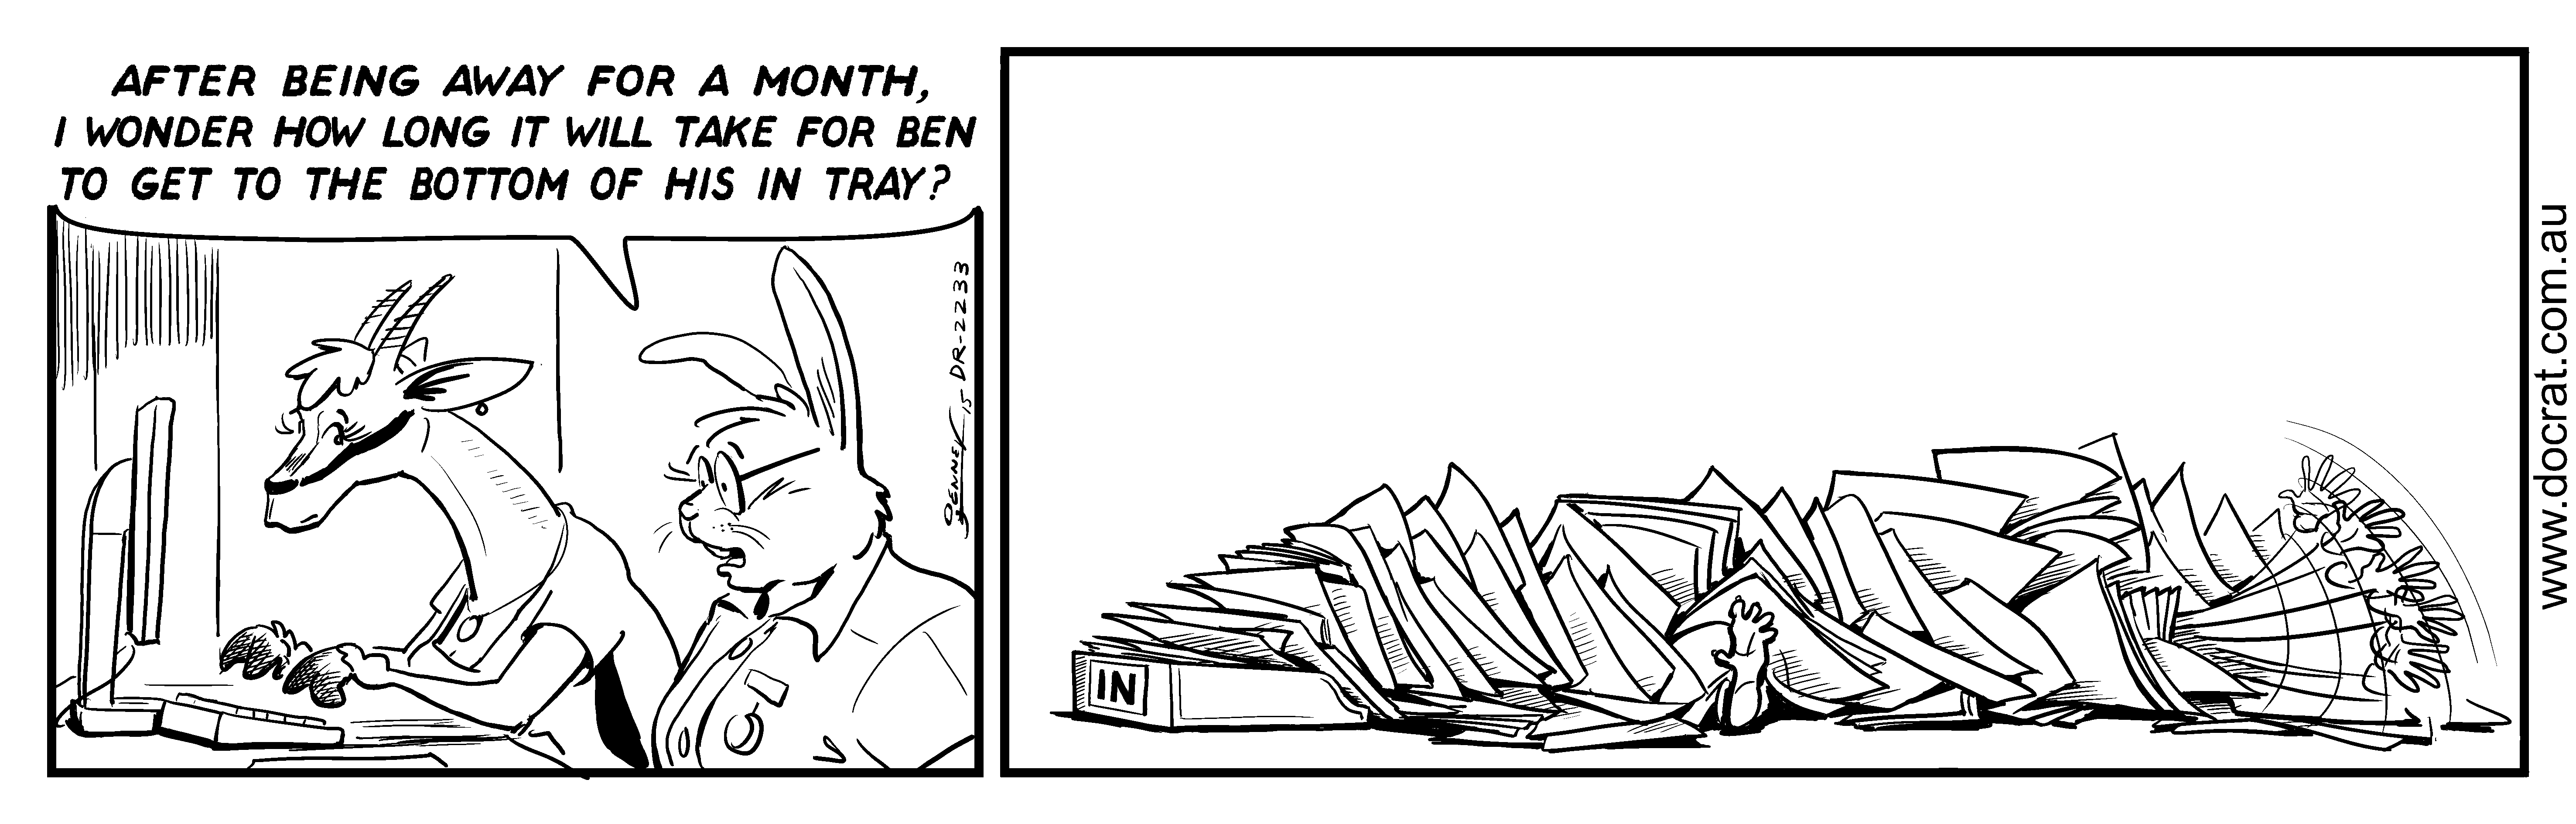 20150318